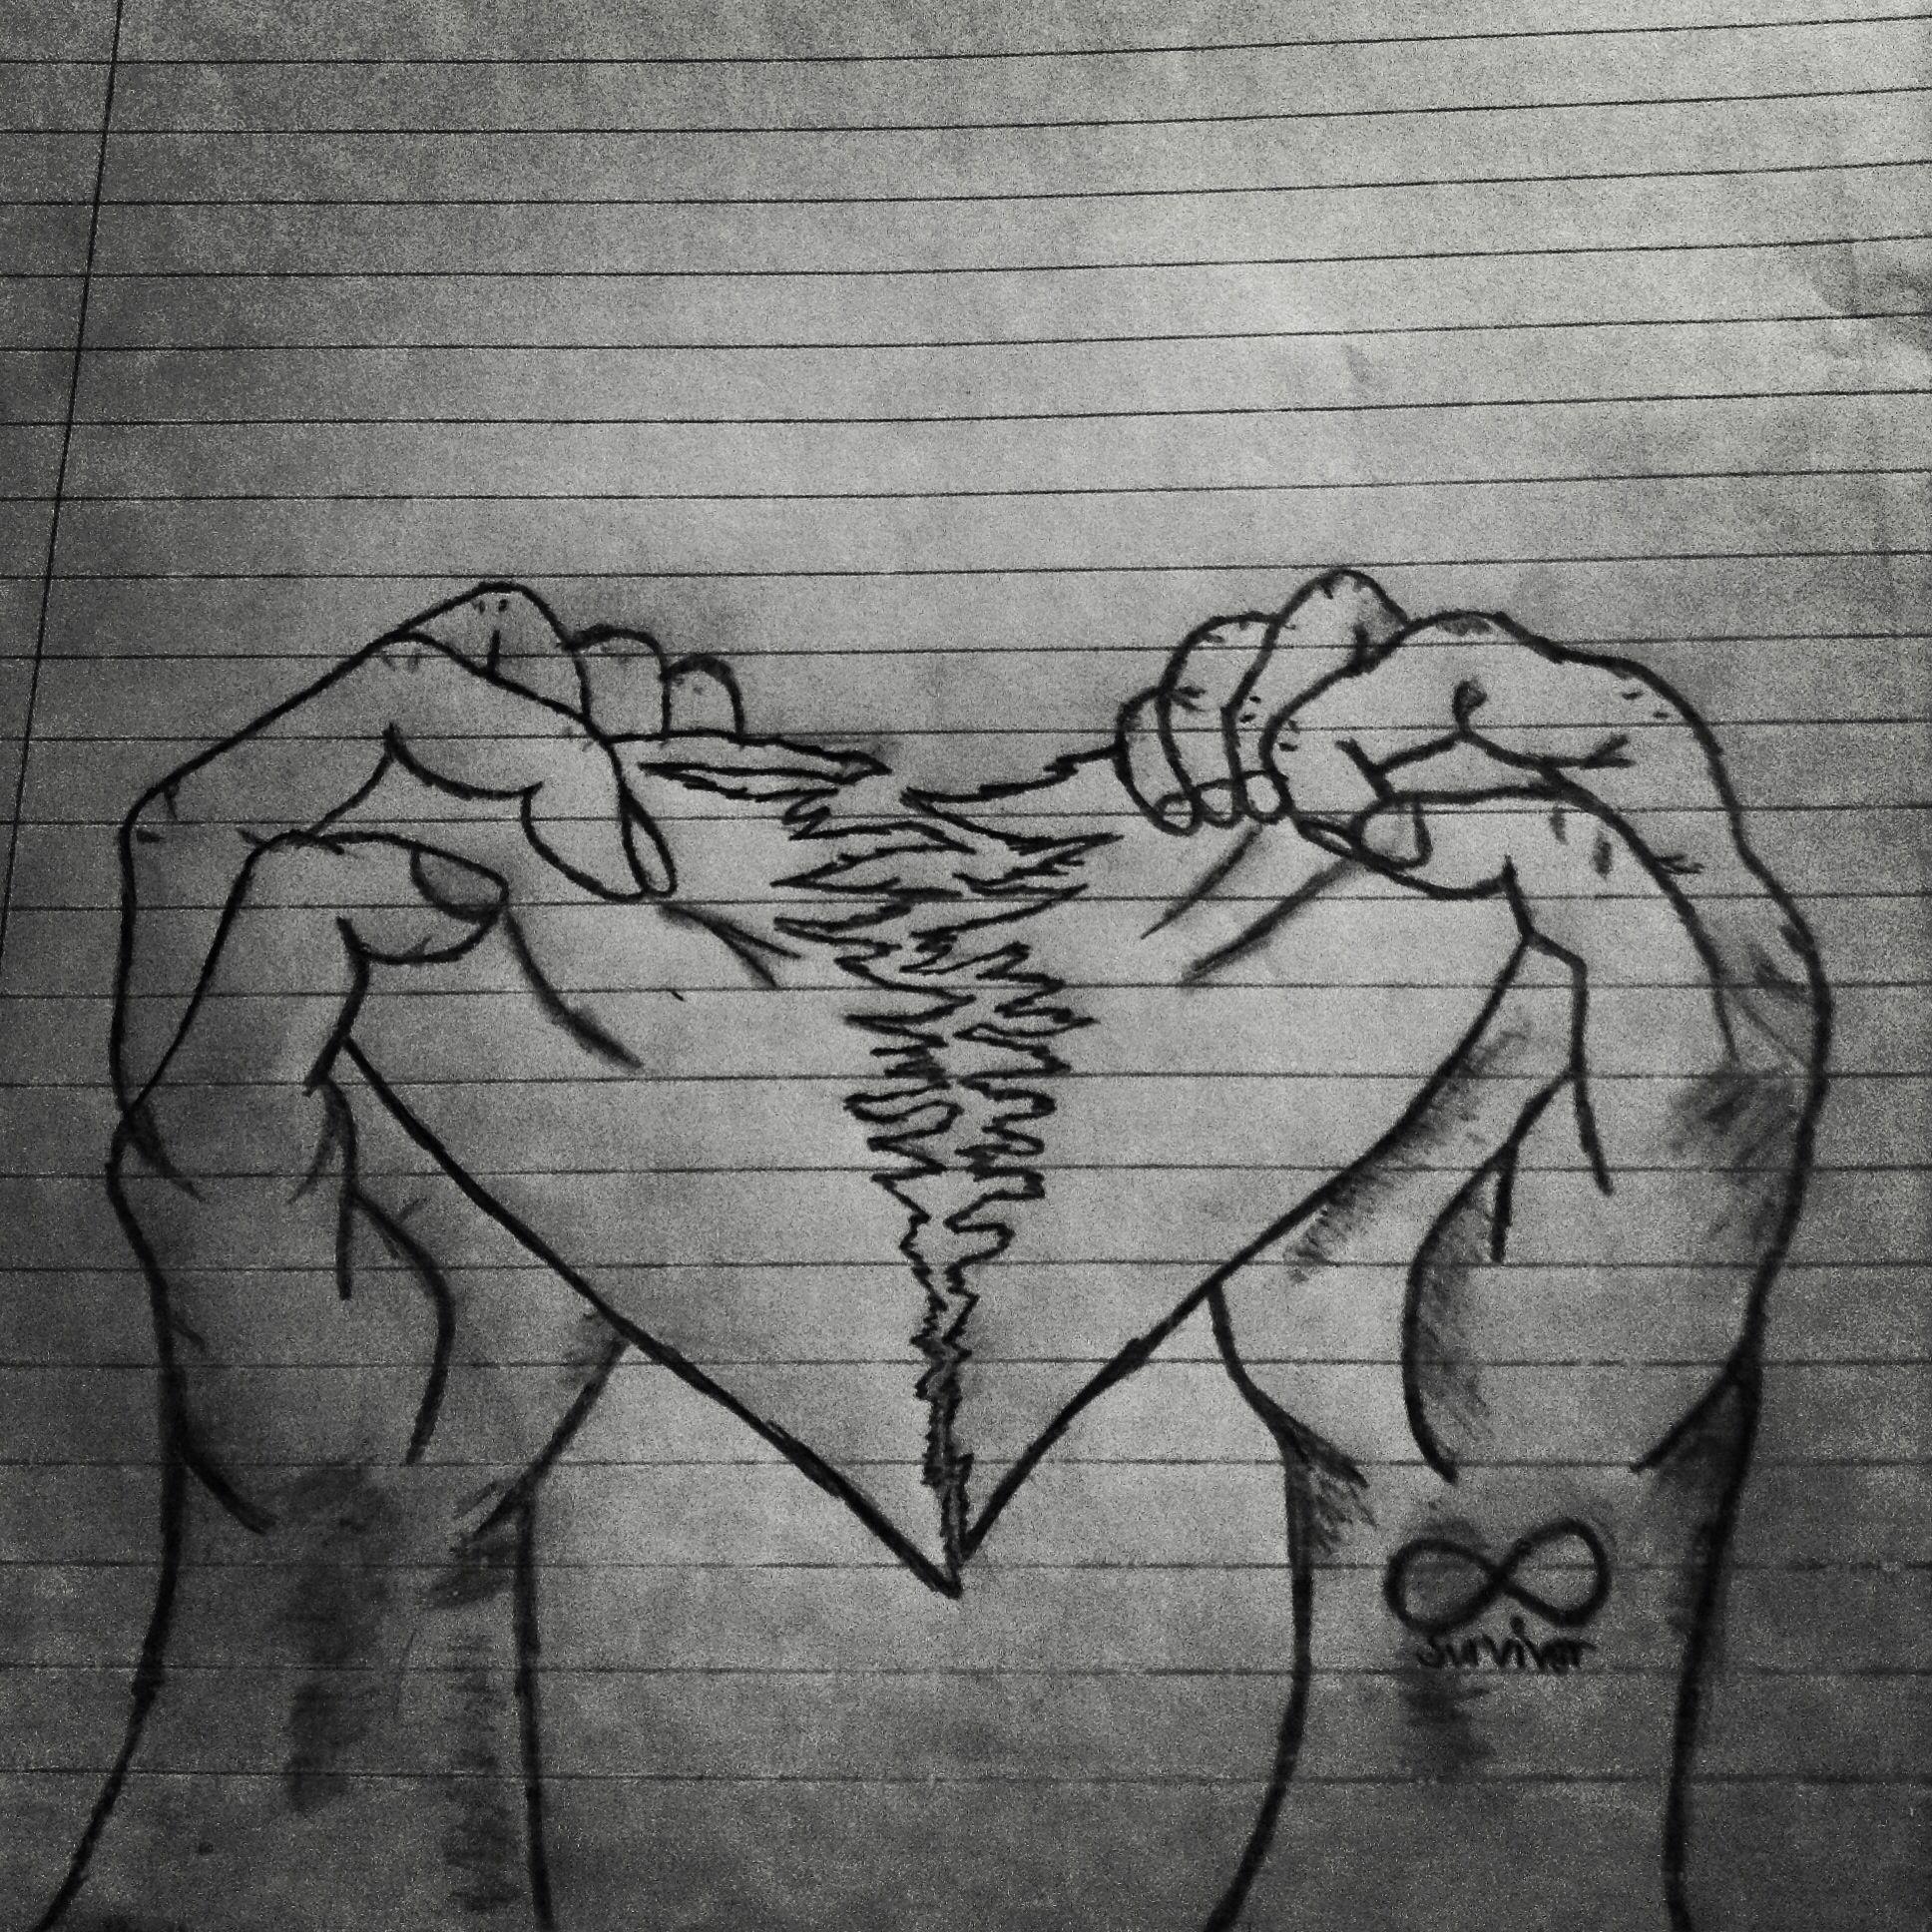 drawings of hearts - HD1936×1936